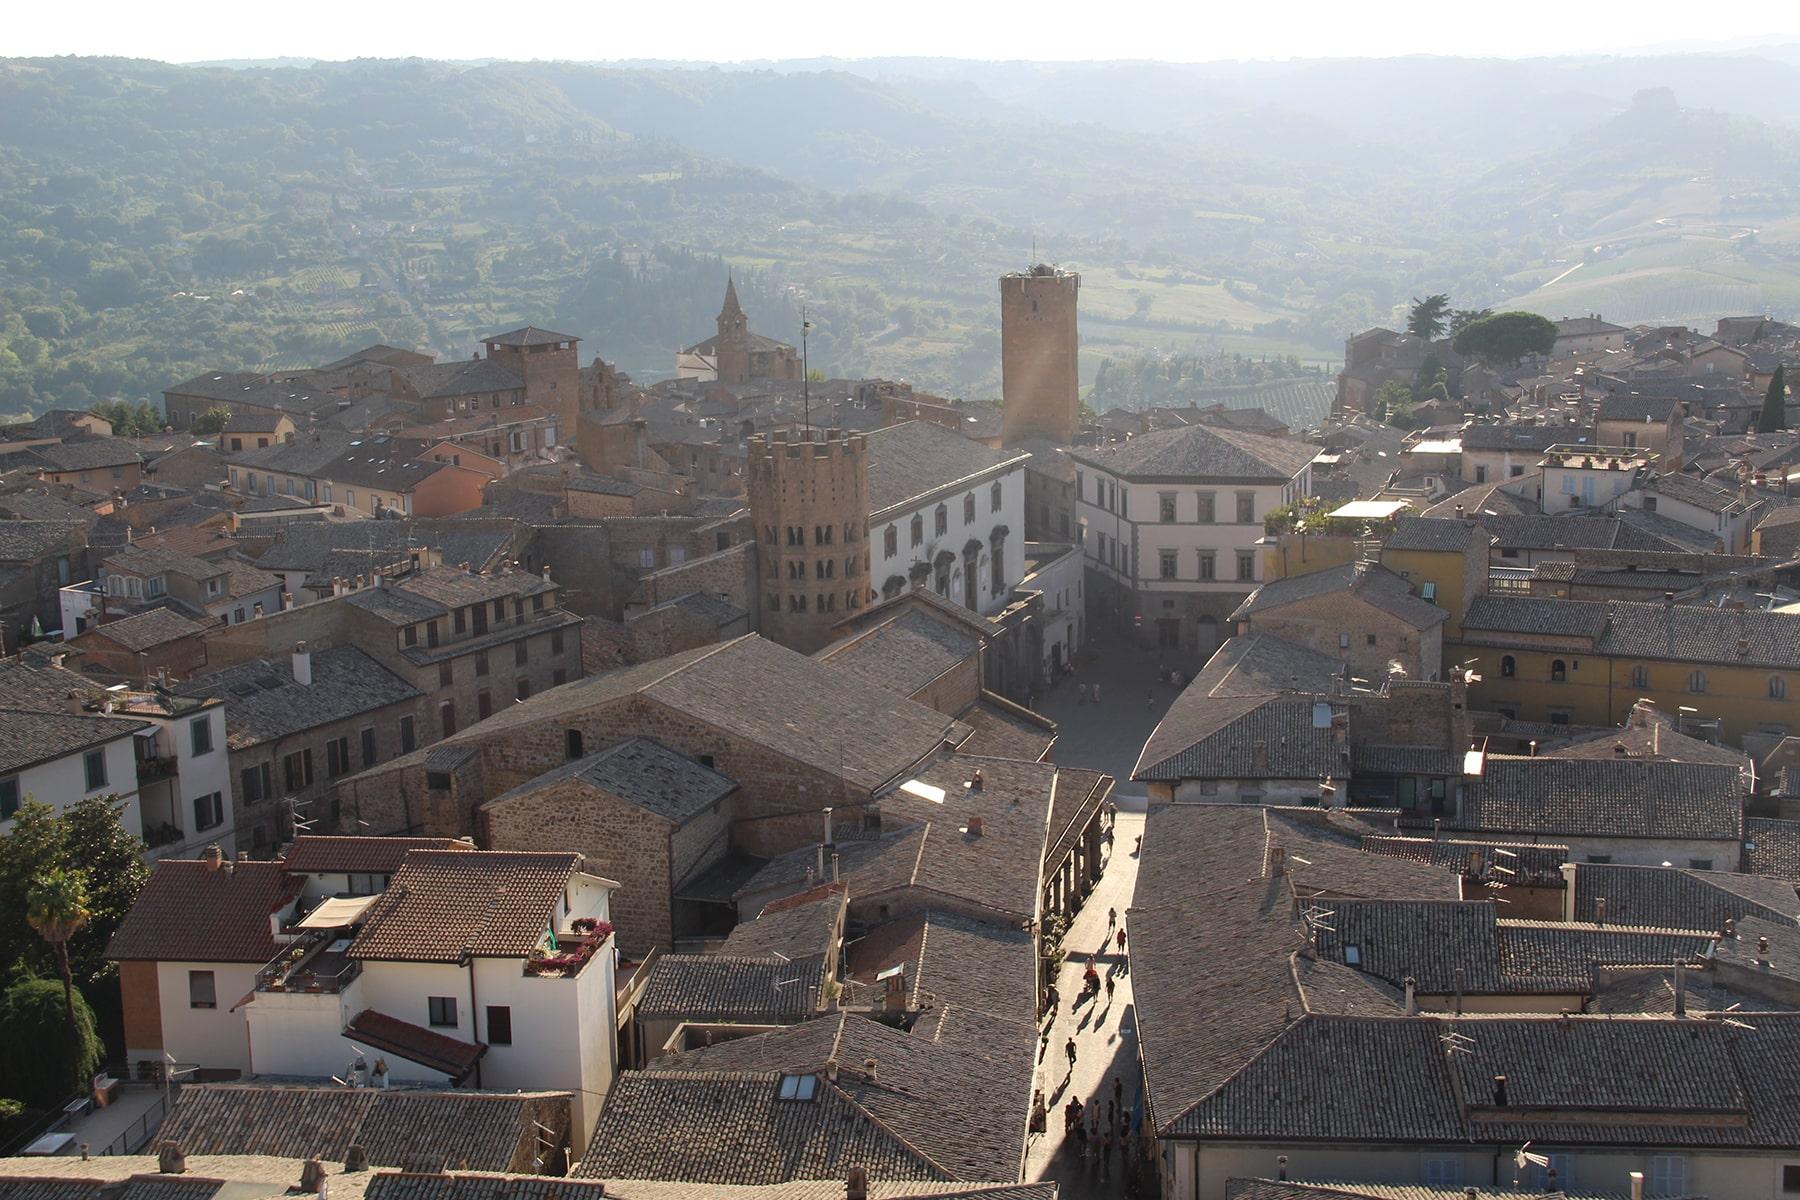 View on city of Orvieto